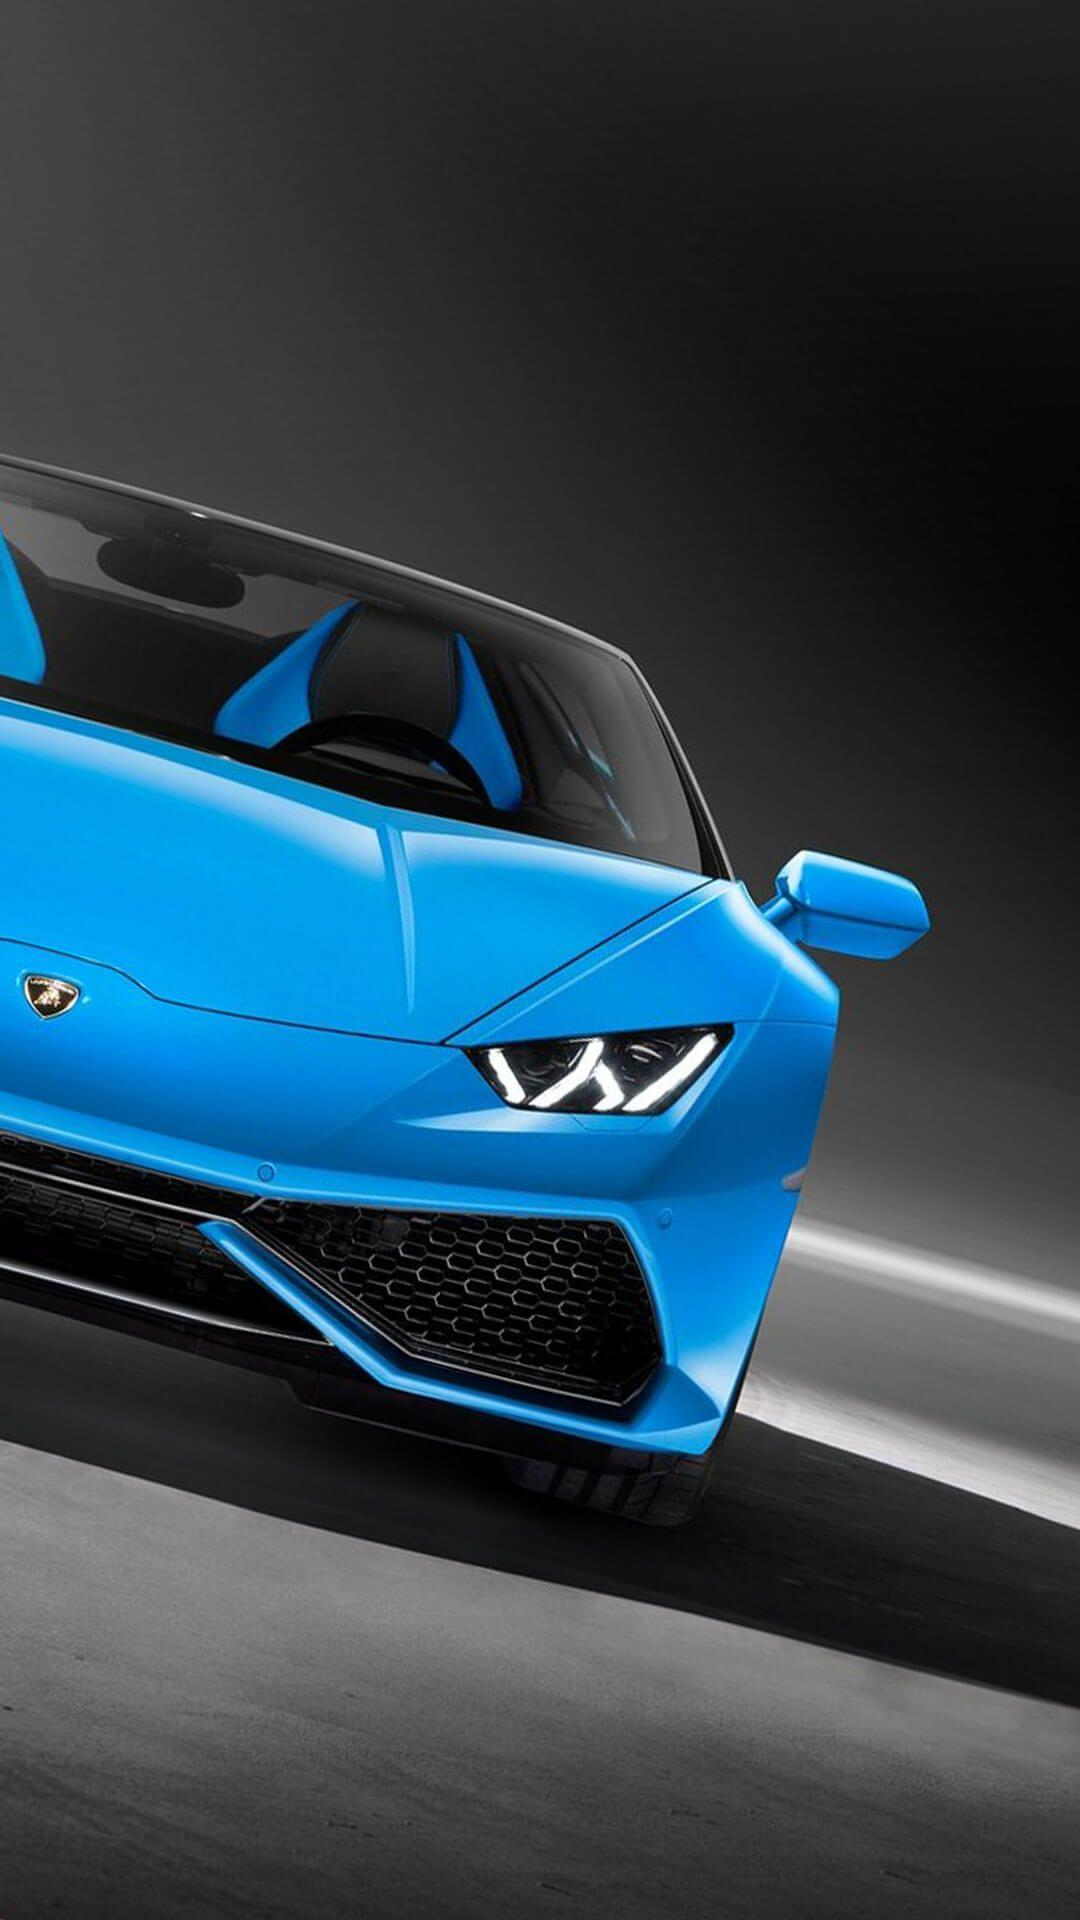 Blue Lamborghini Wallpaper : lamborghini, wallpaper, Lamborghini, Wallpapers, Wallpaper